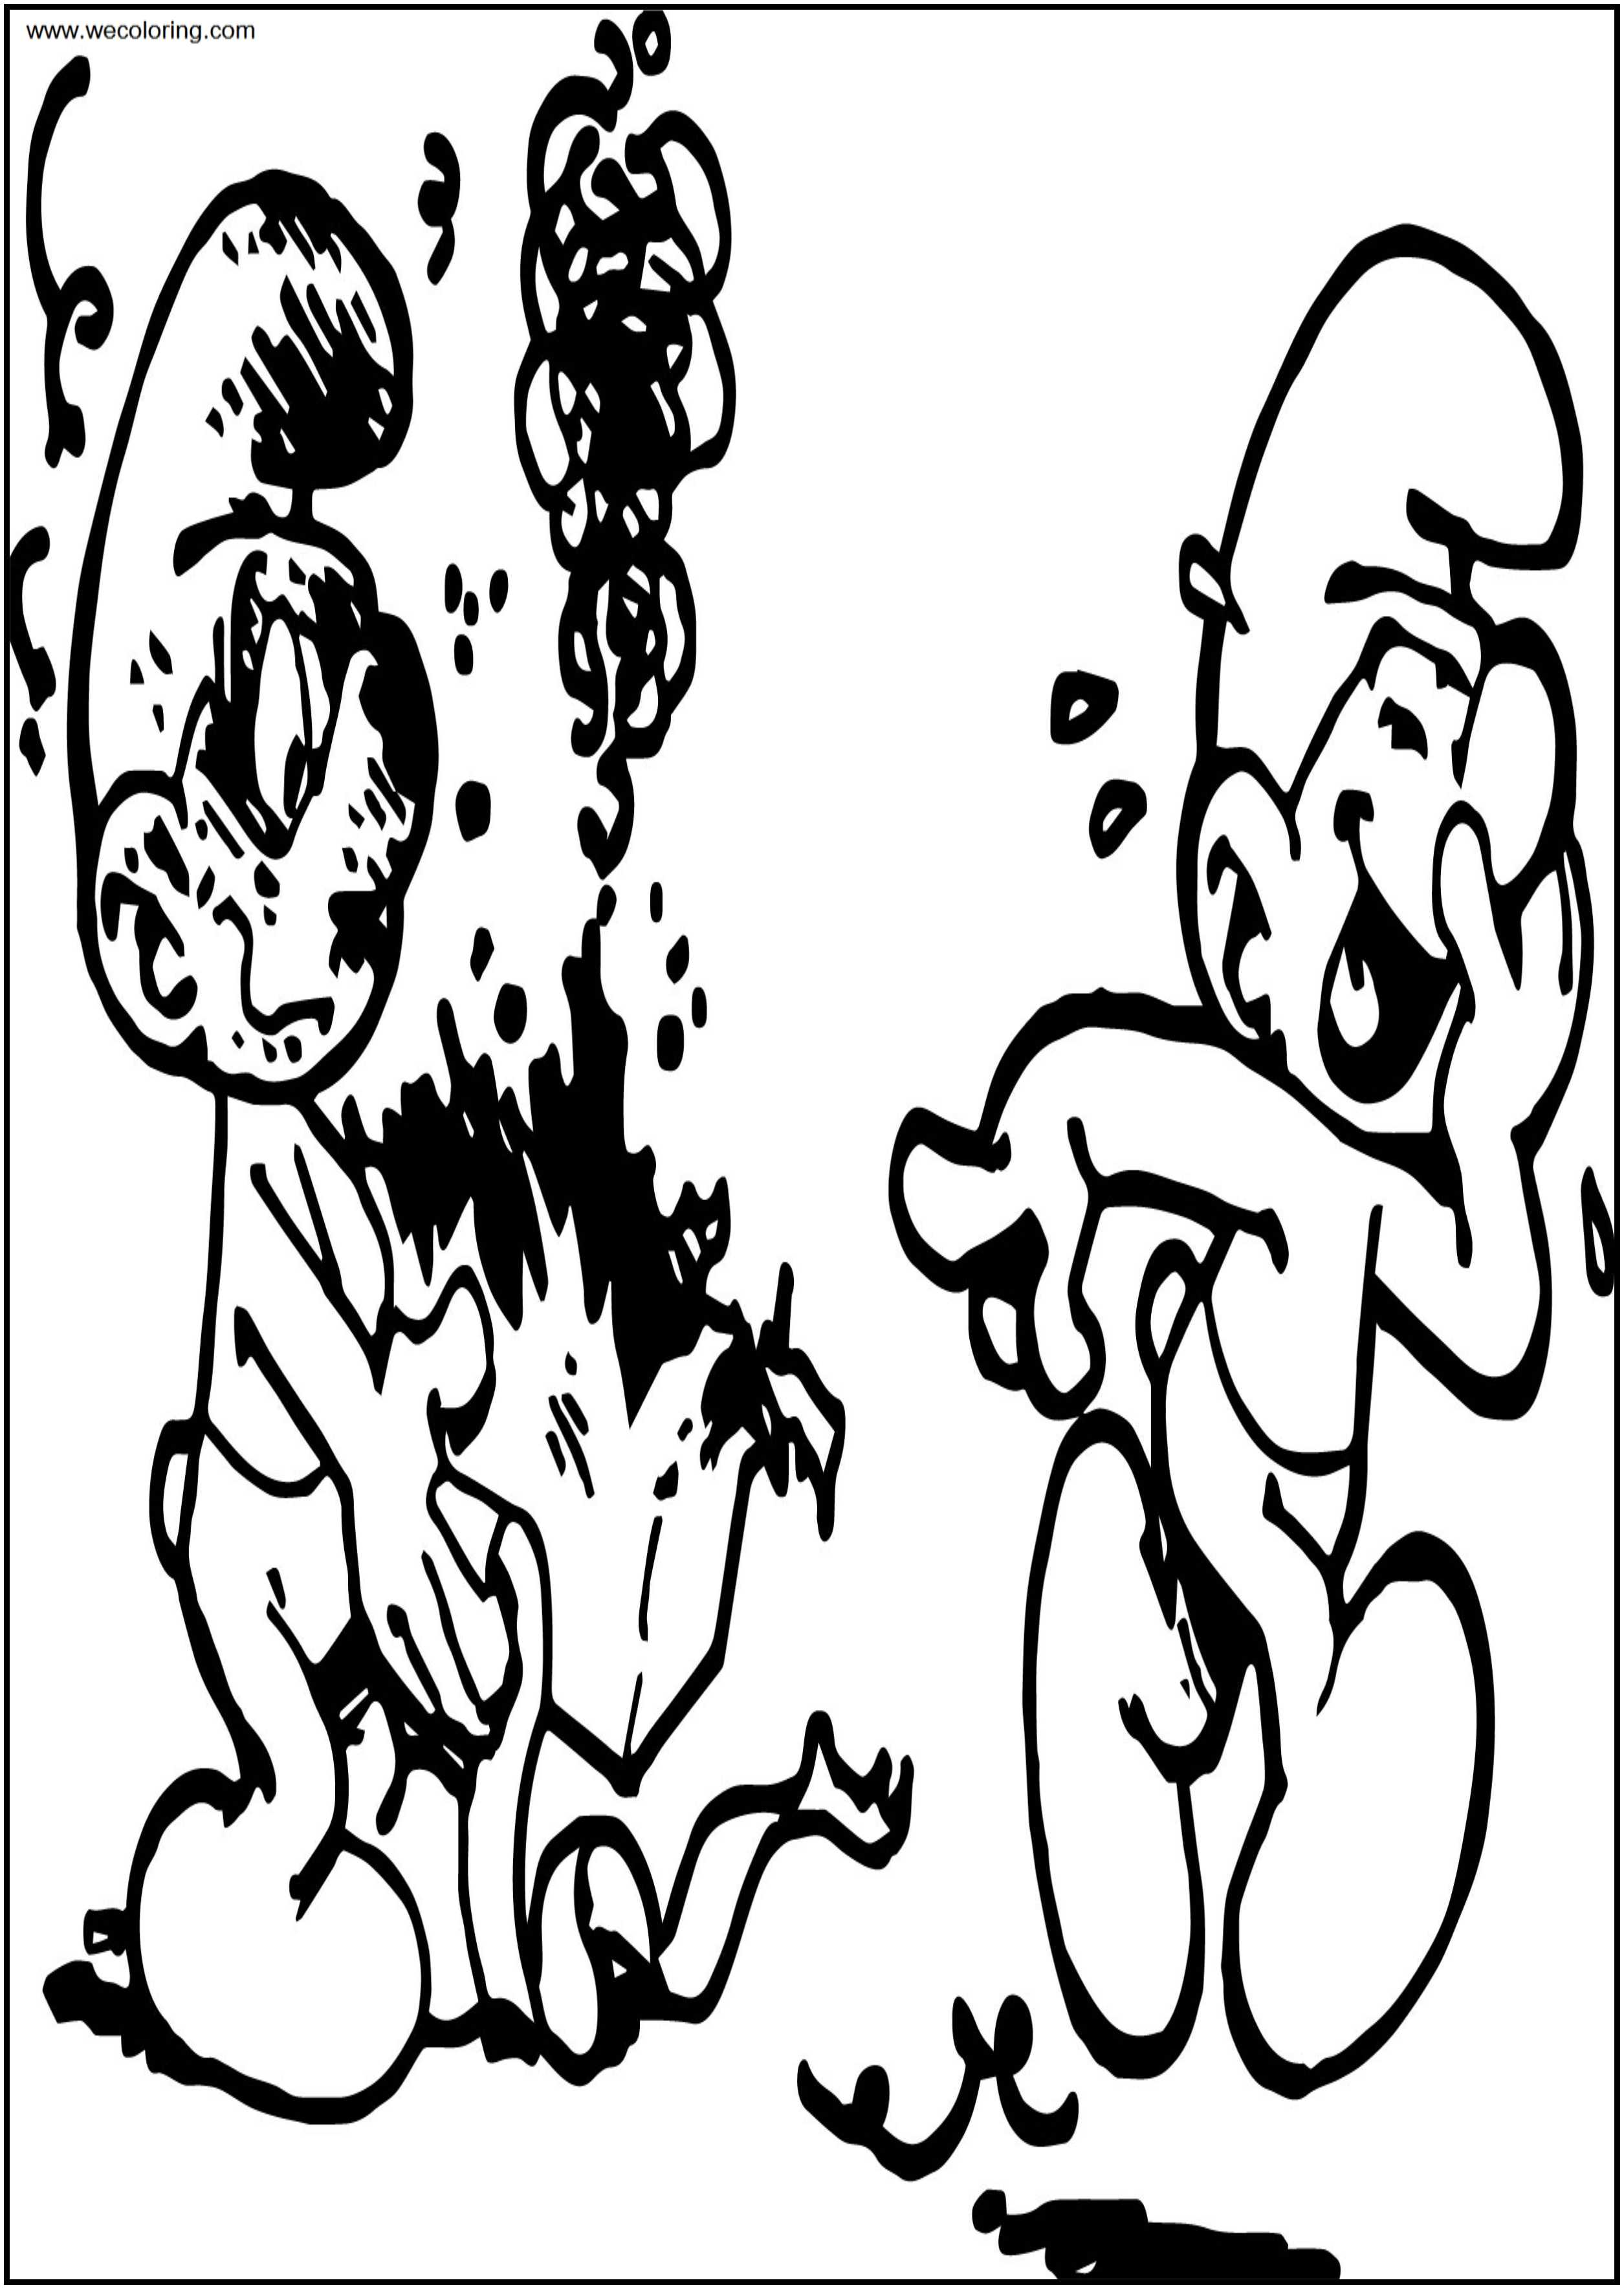 Jokey Smurf Box Gift Free Printable Coloring Page